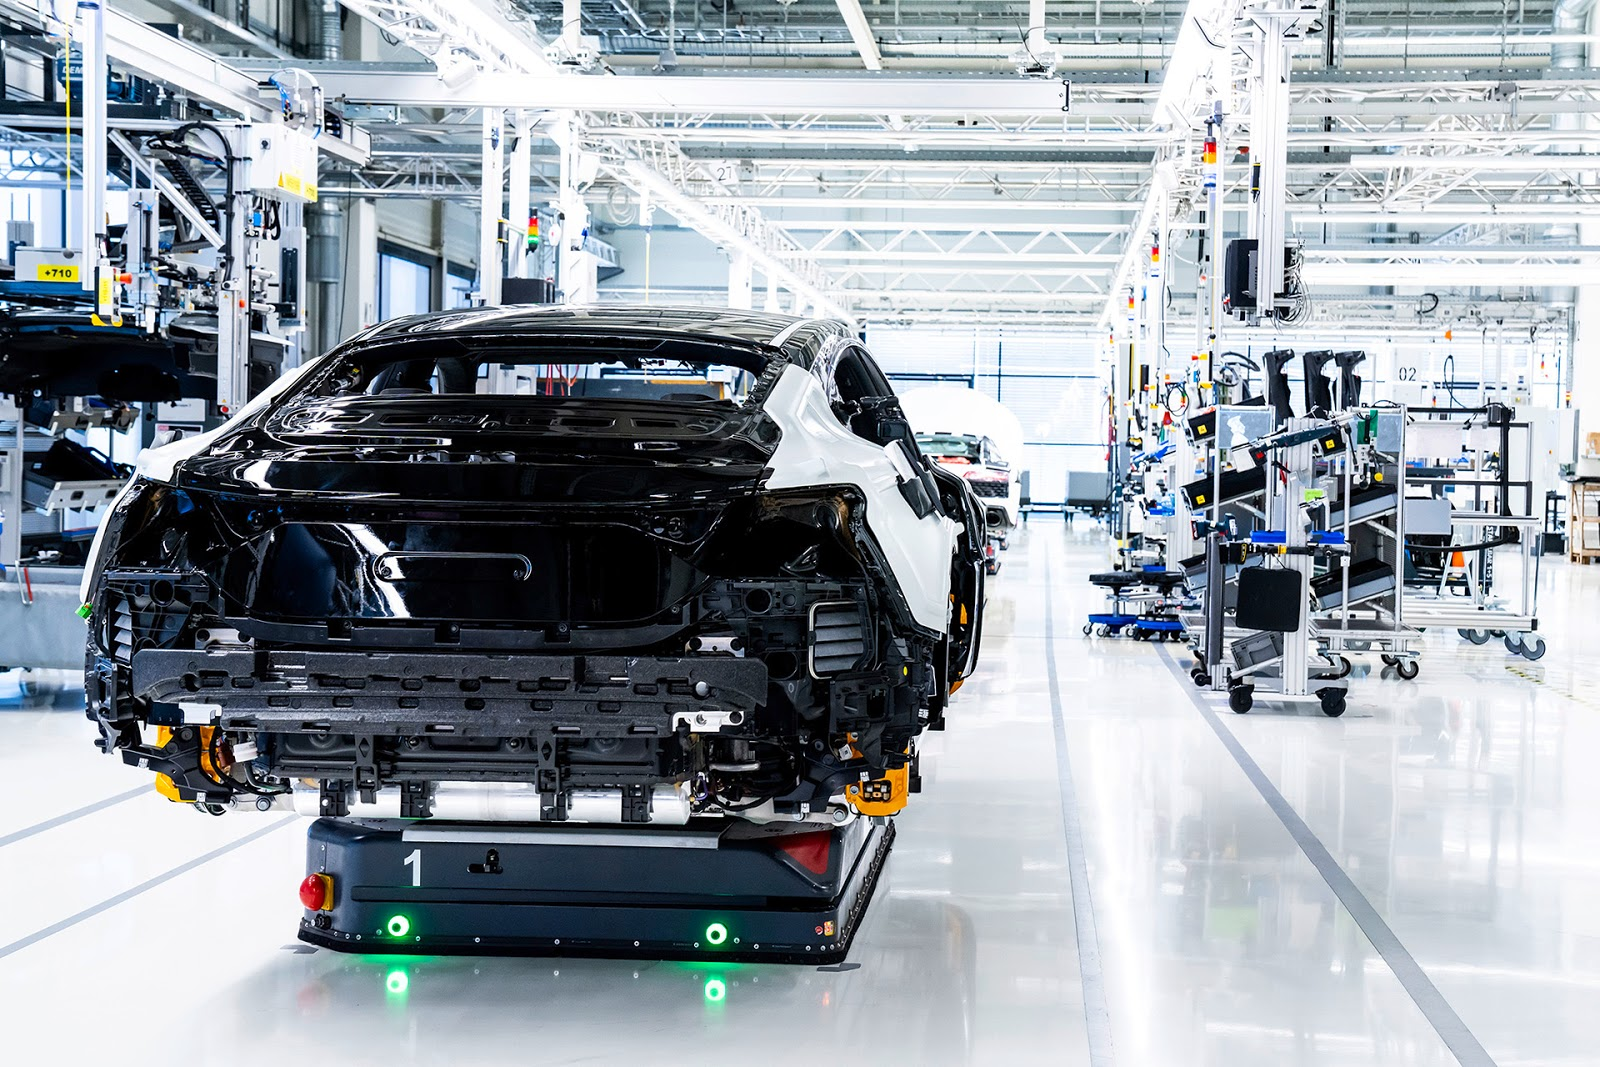 AUDI2B 2B25CE259525CE259D25CE259125CE25A125CE259E25CE25972B25CE25A025CE259125CE25A125CE259125CE259325CE25A925CE259325CE259725CE25A32B25CE25A425CE259F25CE25A52BE TRON2BGT 5 Audi : Ξεκινάει η παραγωγή του e-tron GT Audi, Audi E-tron, E-tron, E-Tron GT, Electric cars, electric vehicles, EV, ειδήσεις, ηλεκτρικά, ηλεκτροκινηση